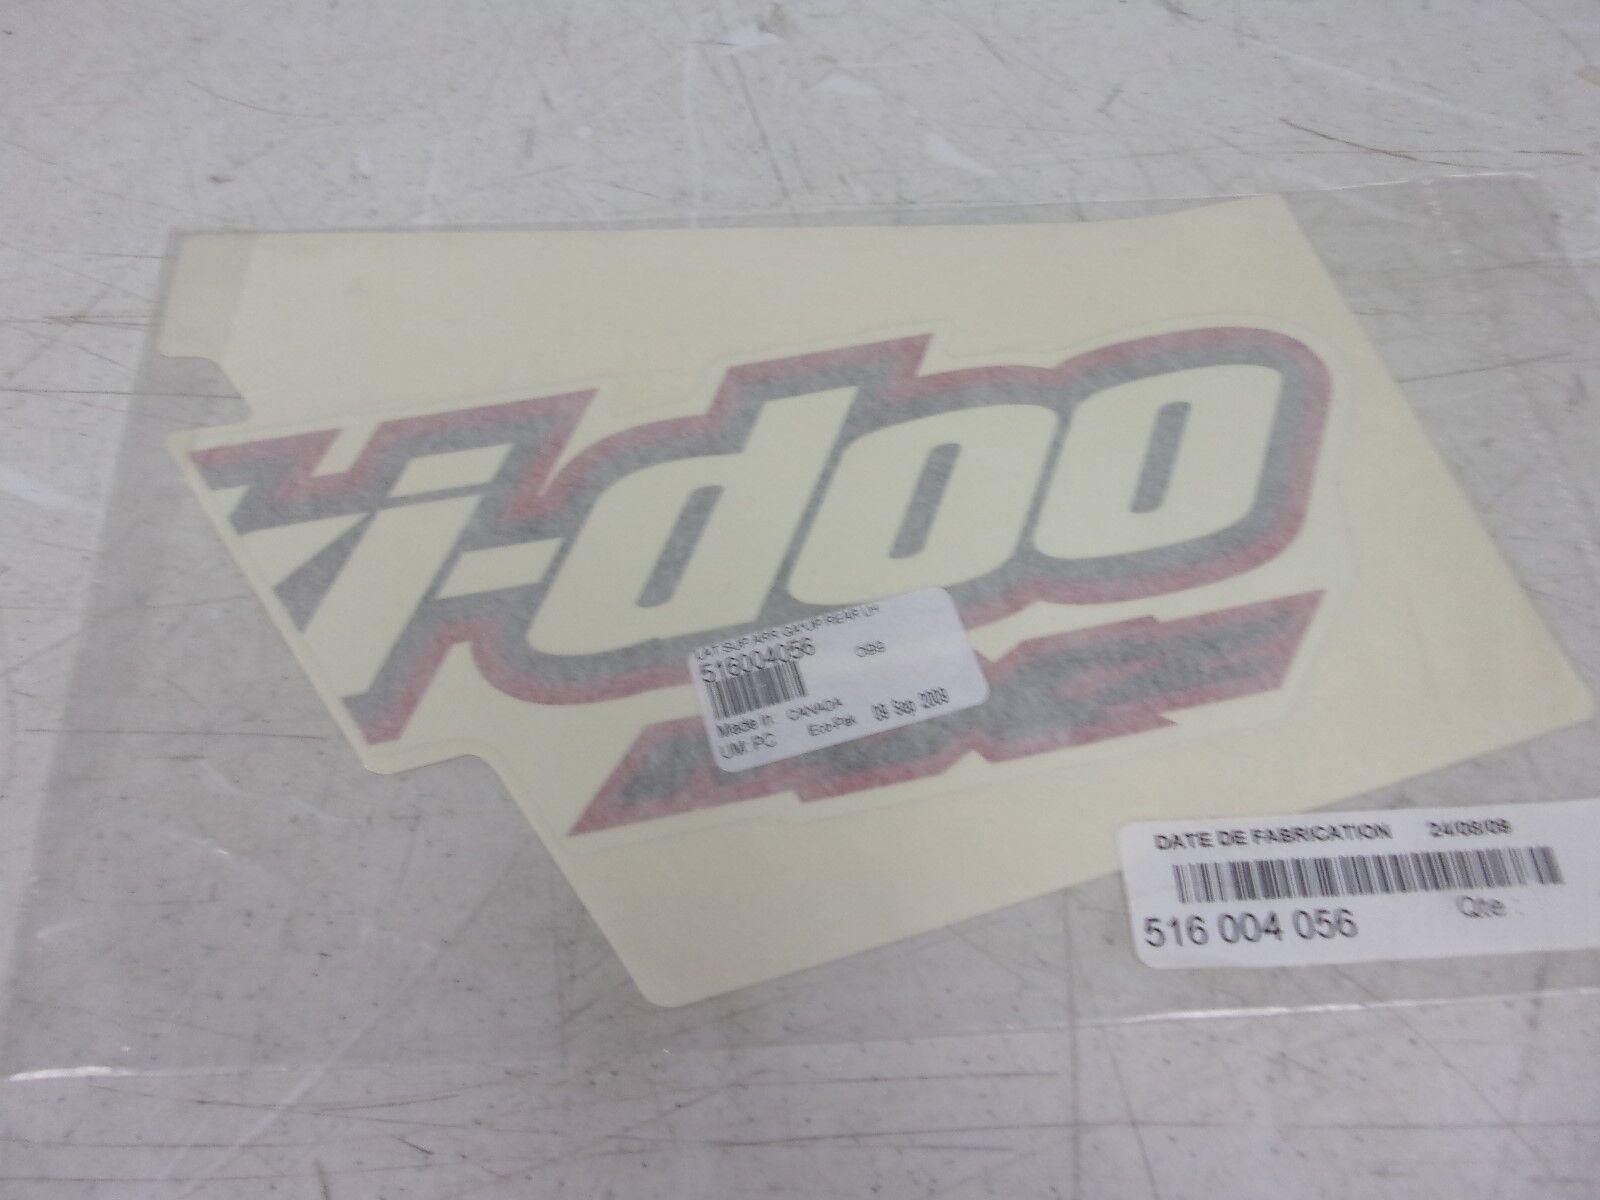 Ski-doo Snowmobile LH Rear Upper Side Decal 516004056